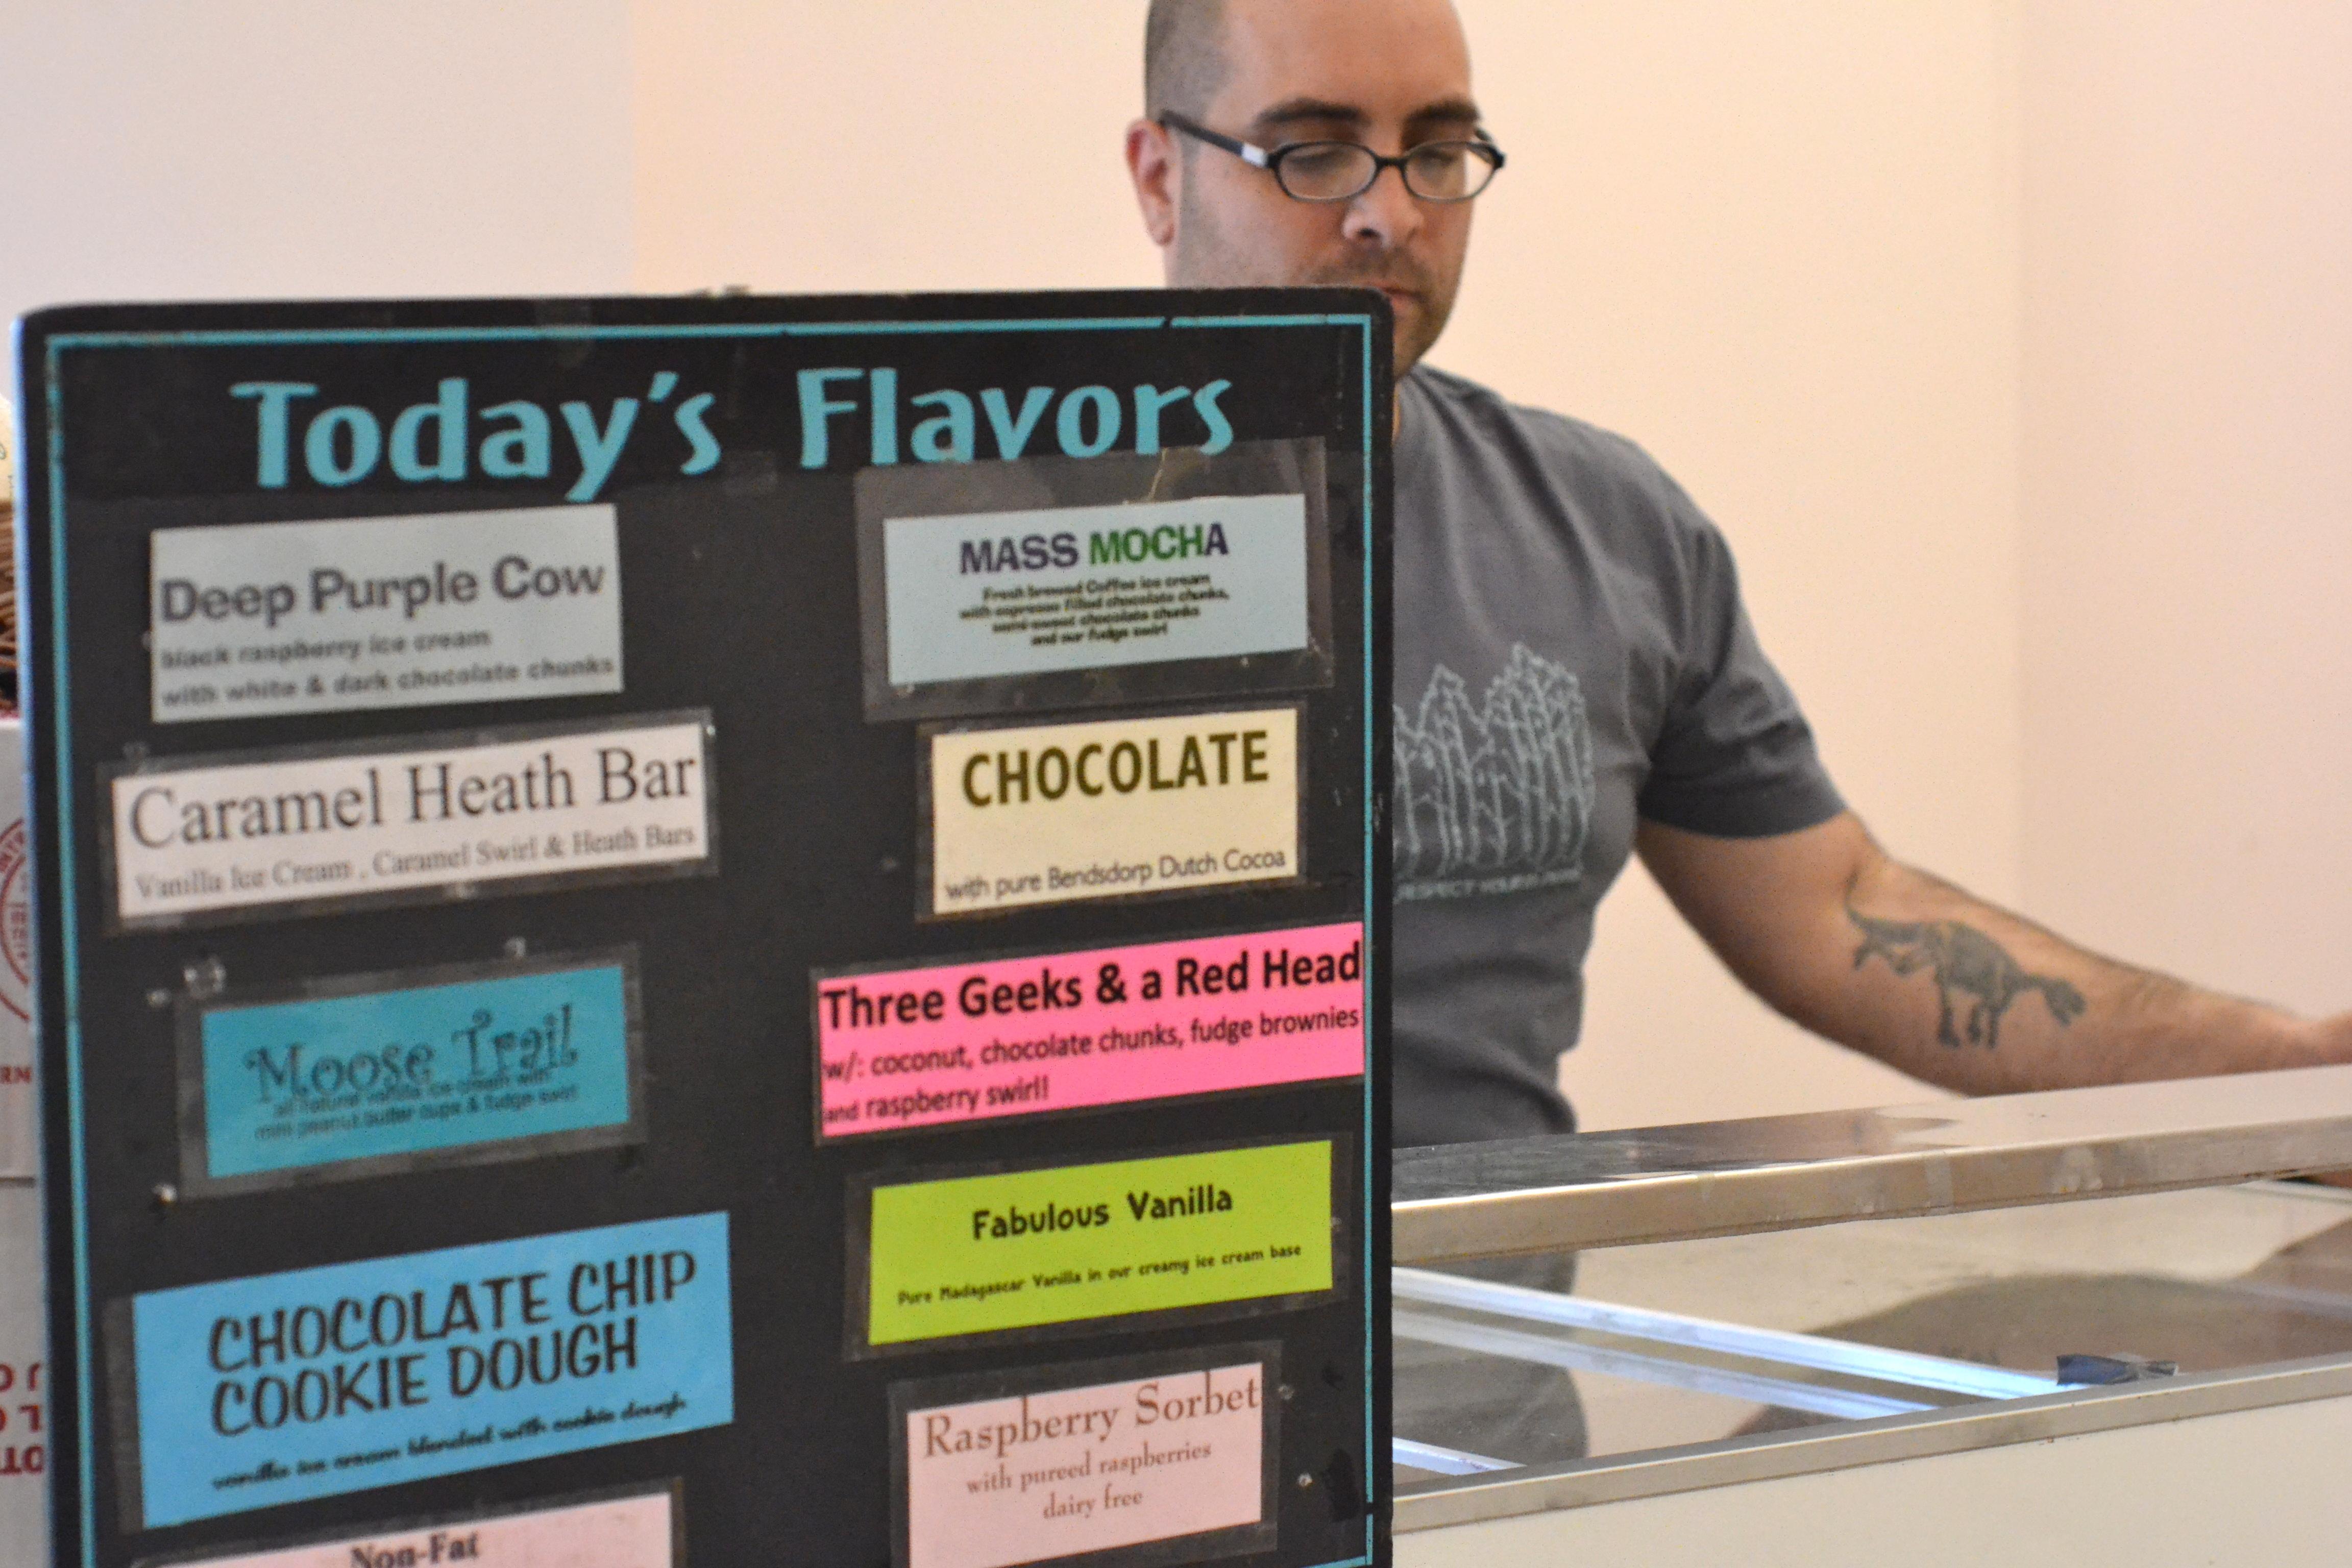 Bart's Ice Cream. [photo credit: Rebekah Hanlon]